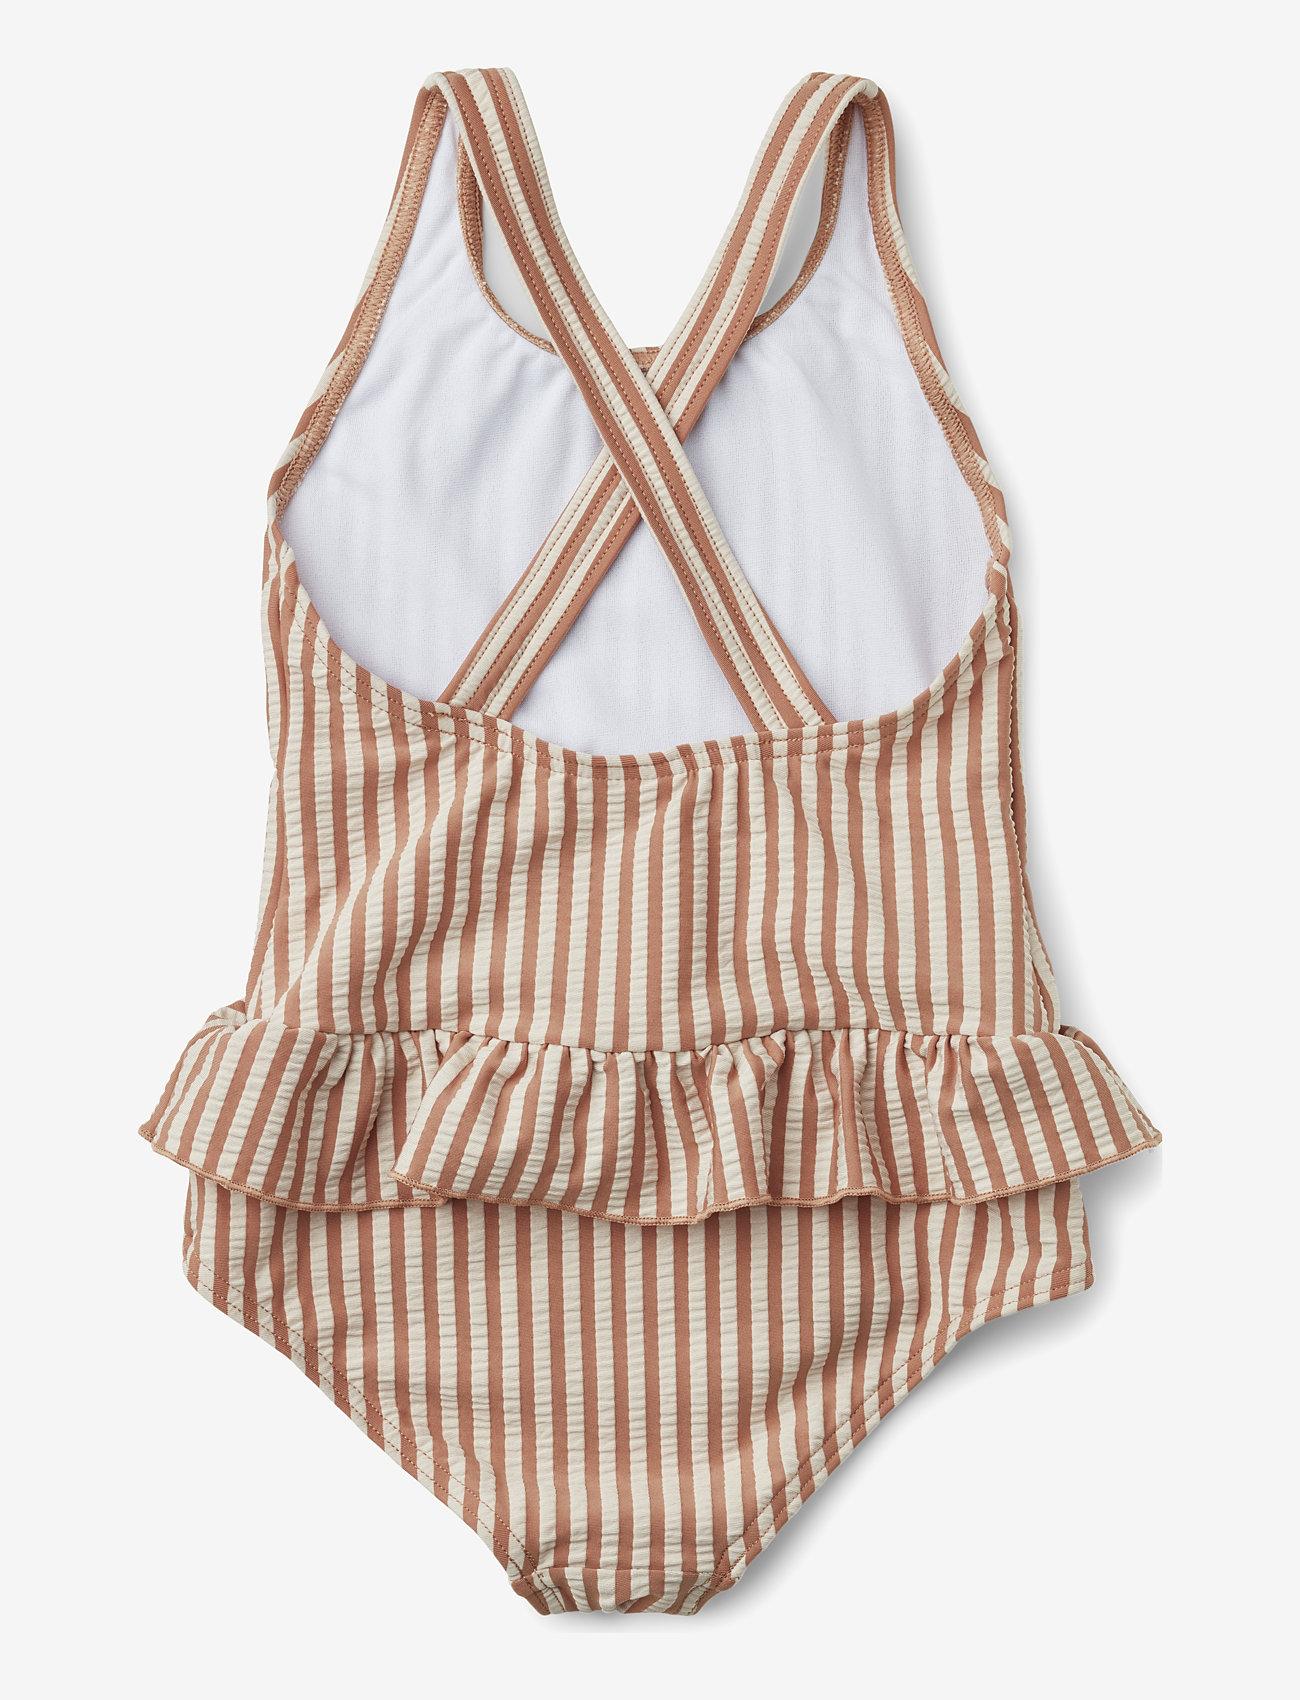 Liewood - Amara swimsuit seersucker - swimsuits - y/d stripe - 1